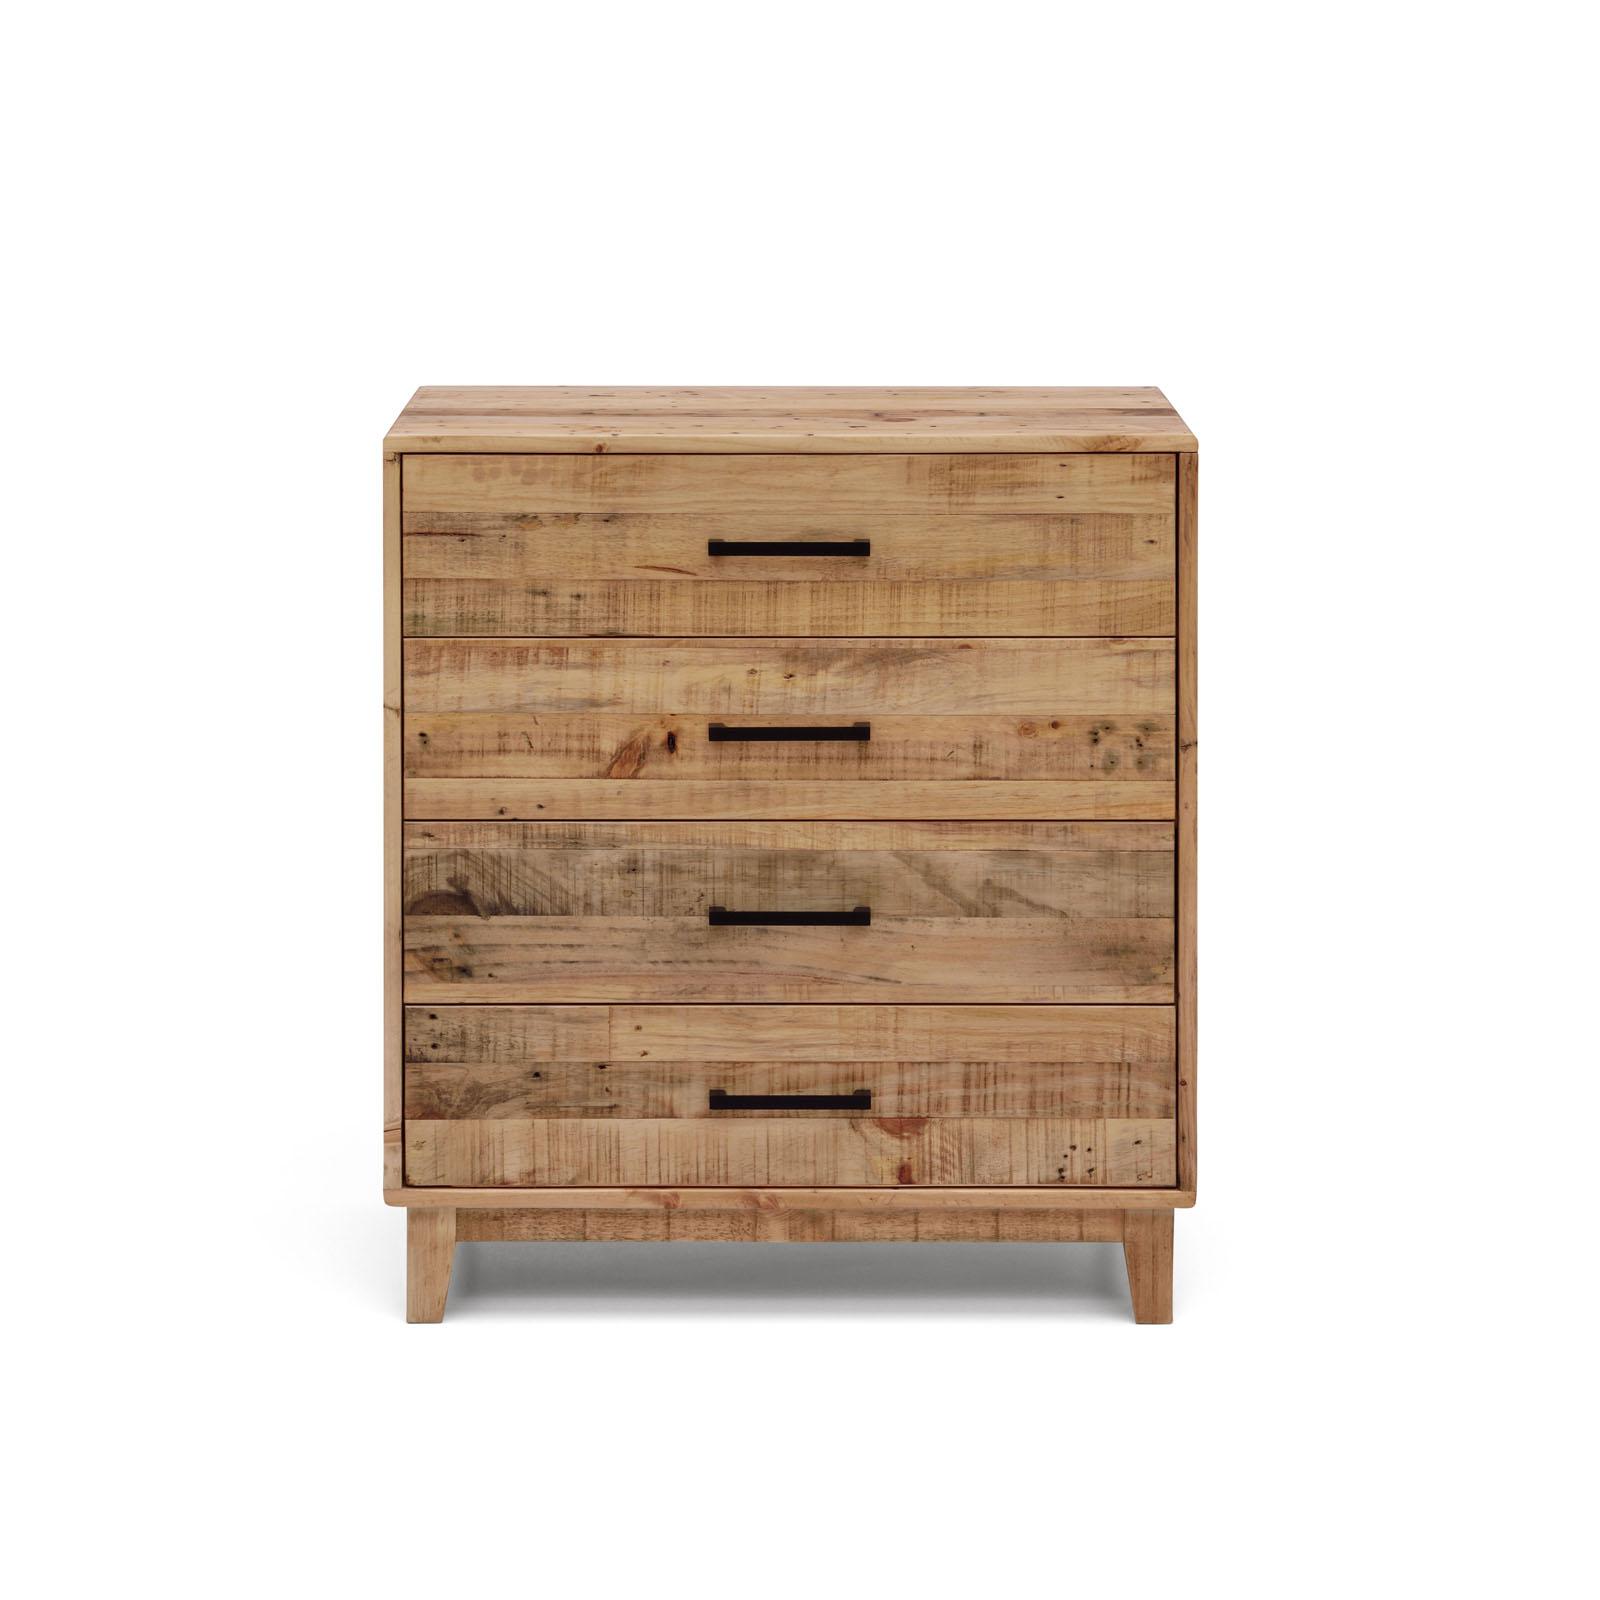 Oak Wood Furniture Portland Or Oak Wood Furniture Uk Oak  : 10 3041 from mpfmpf.com size 1600 x 1600 jpeg 196kB